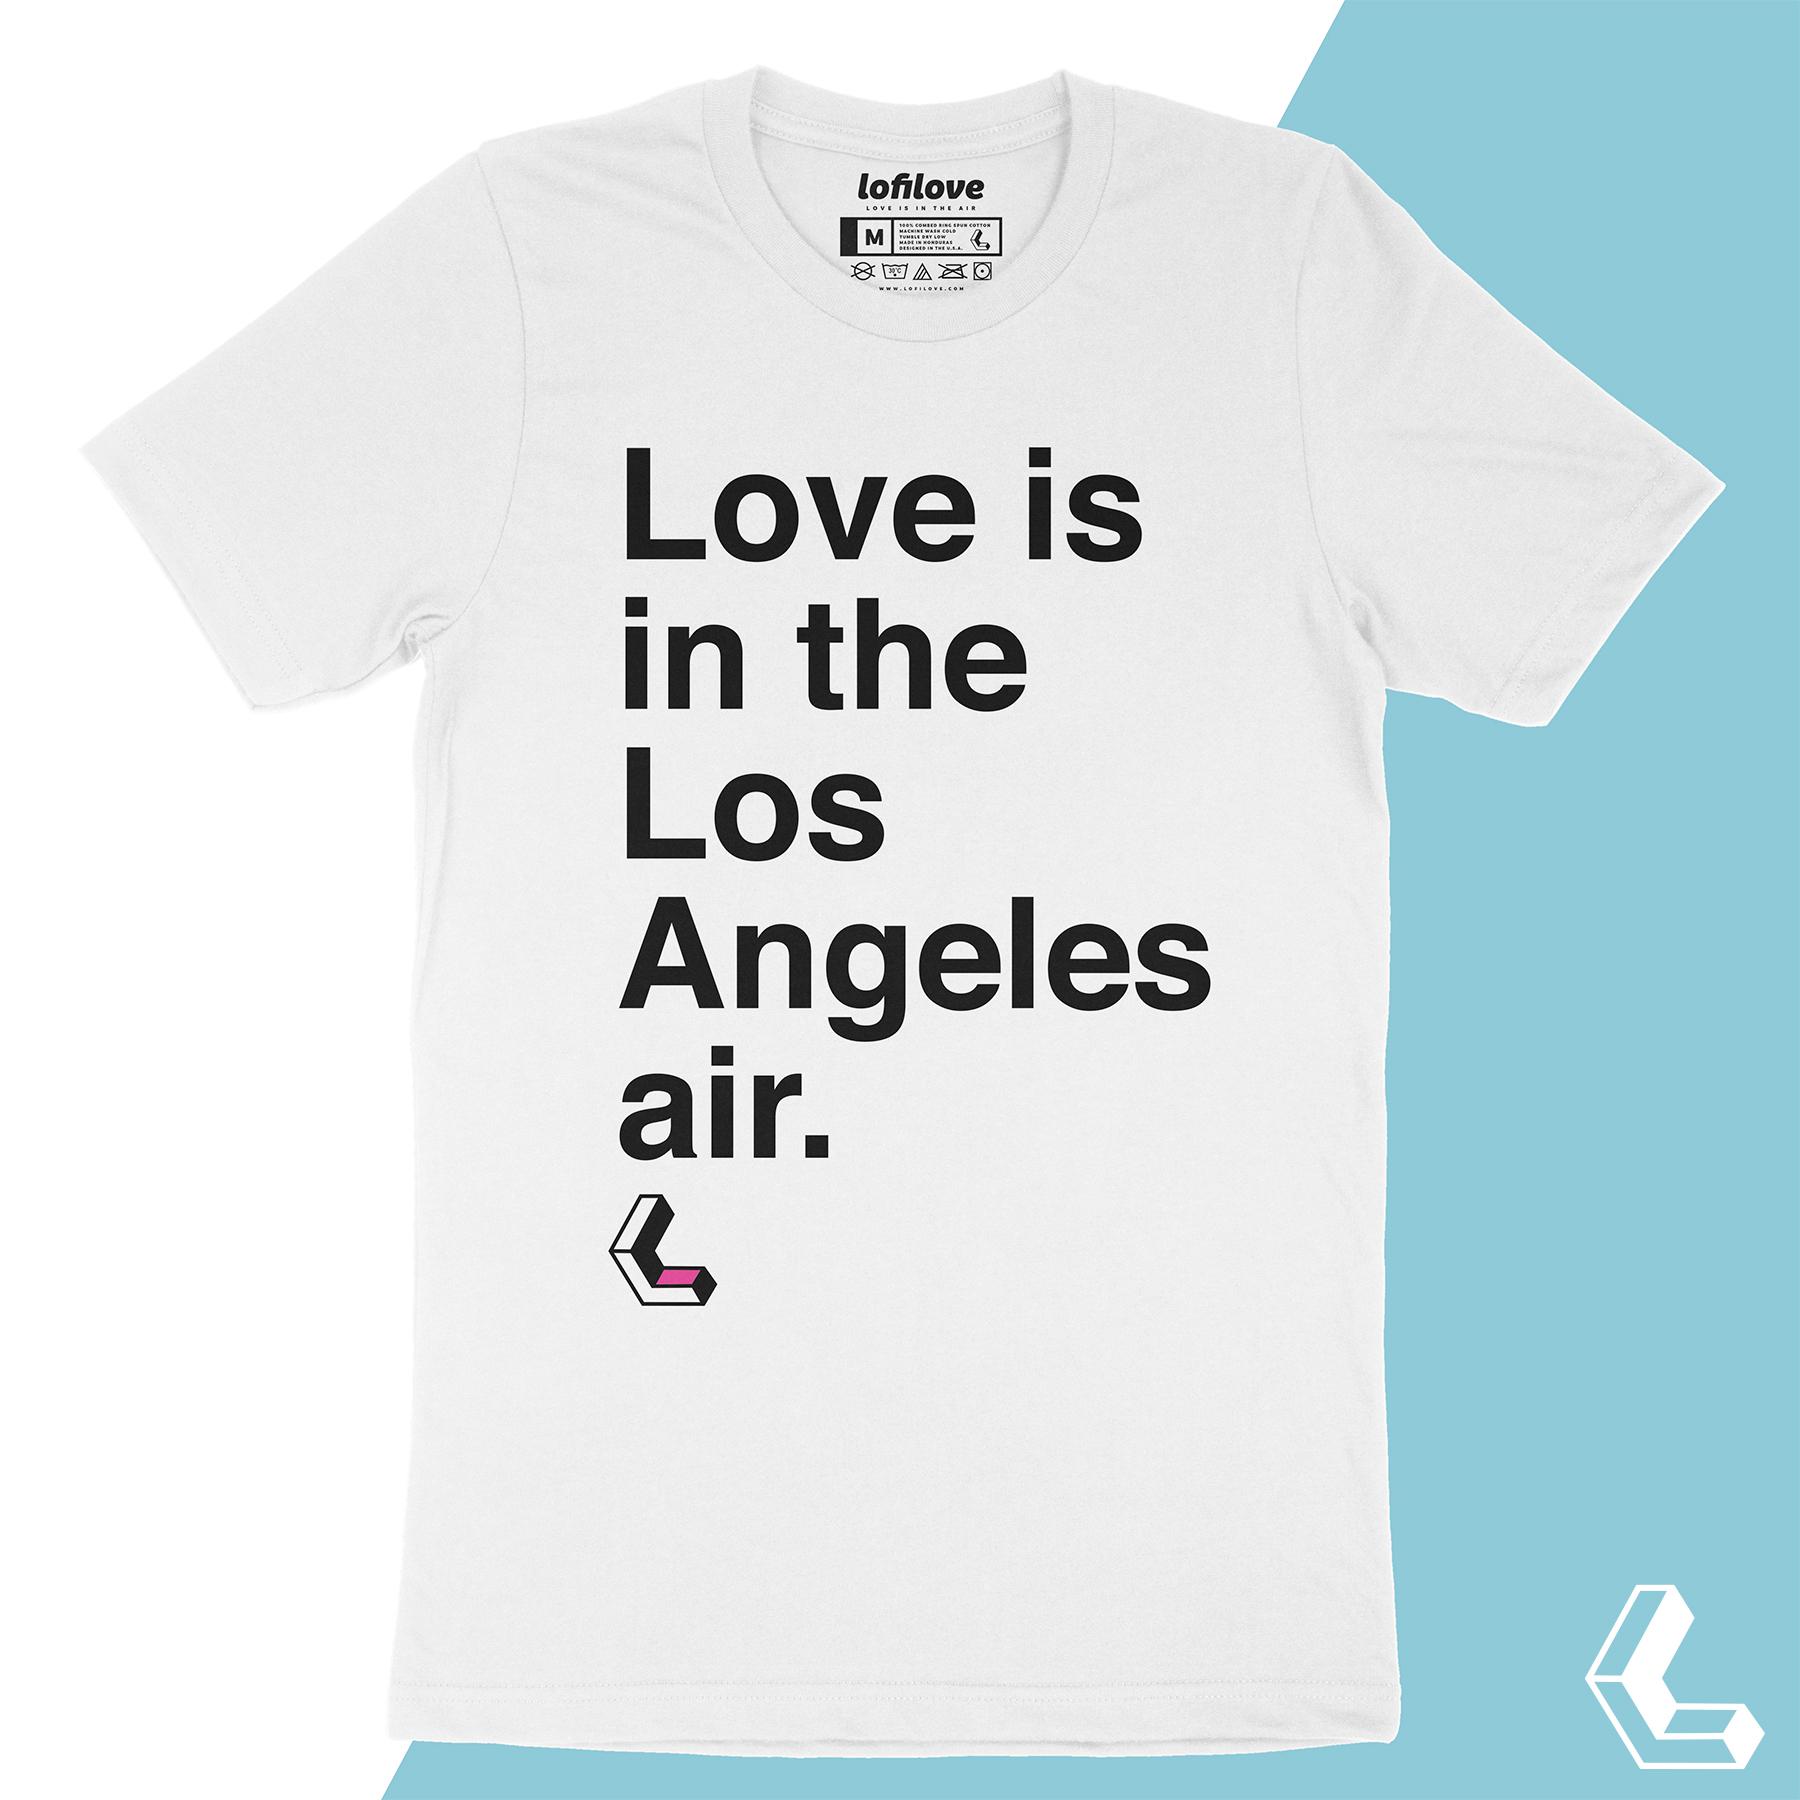 lofilove-love-is-in-the-air-tee-1